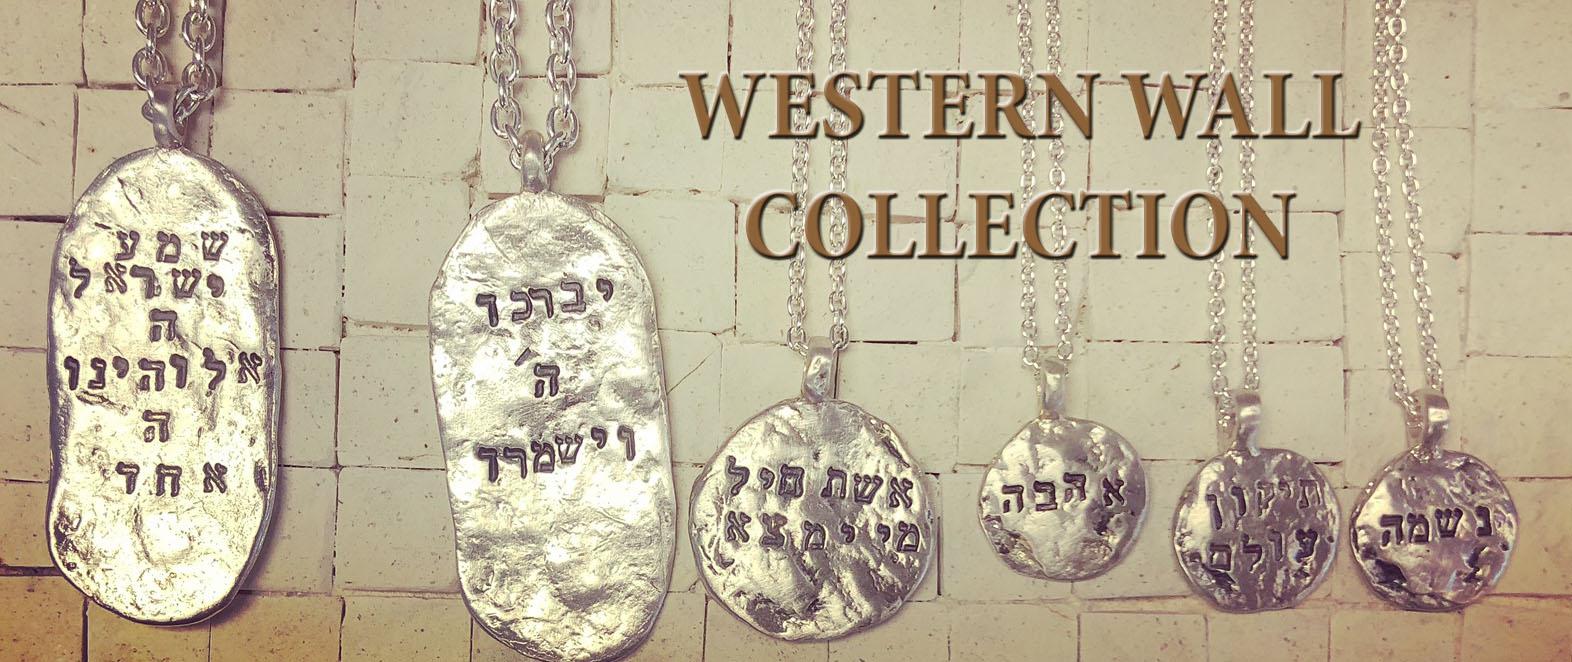 WesternWall_2